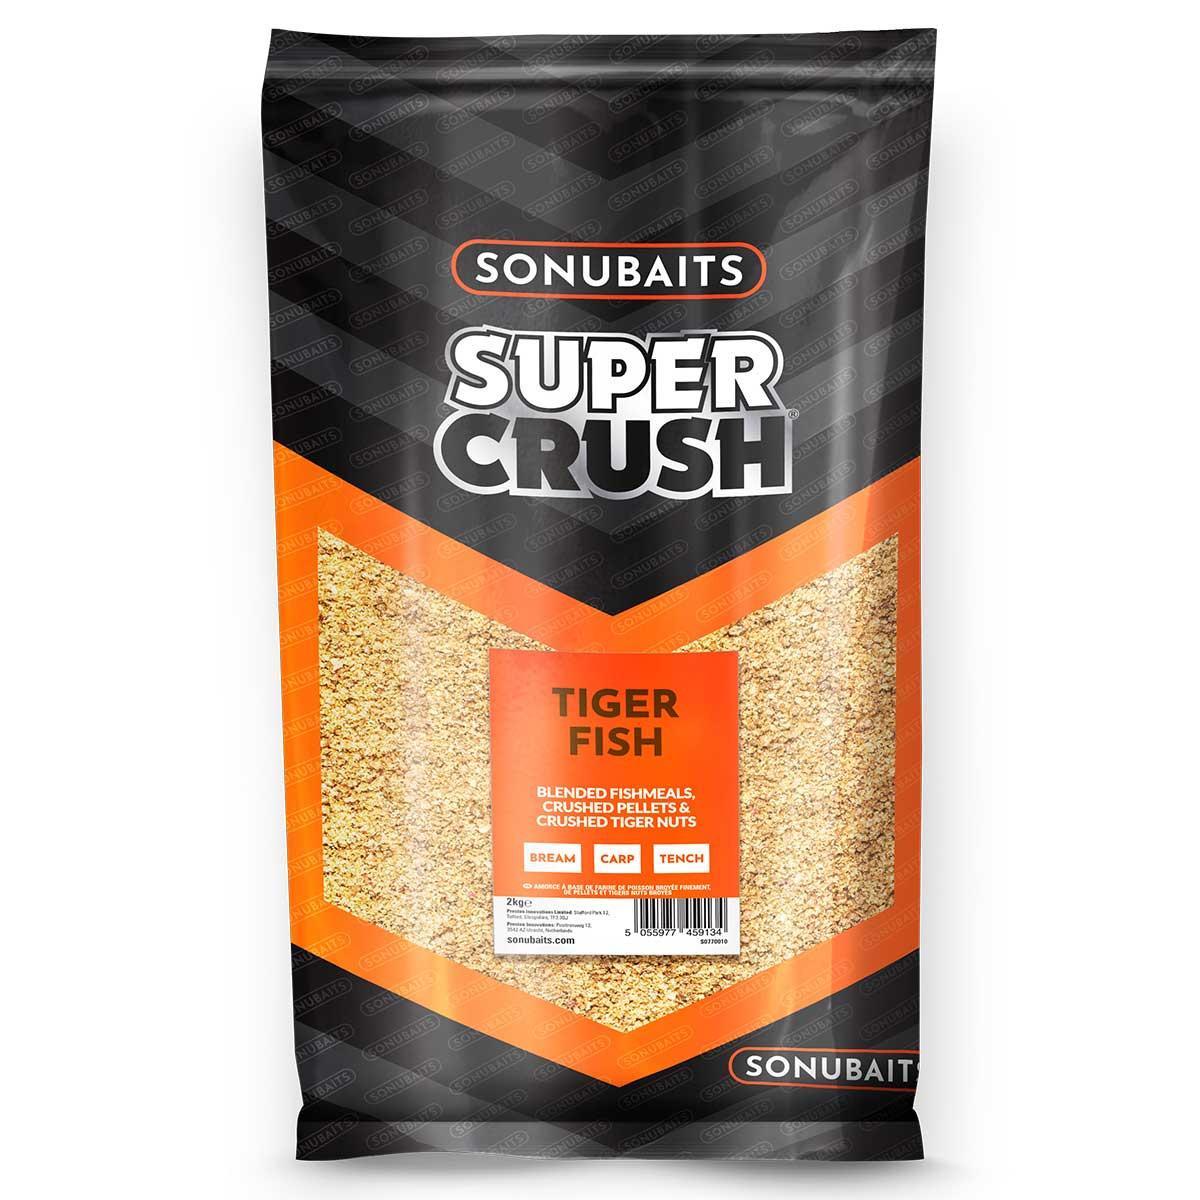 Sonubaits Super Crush Tiger Fish